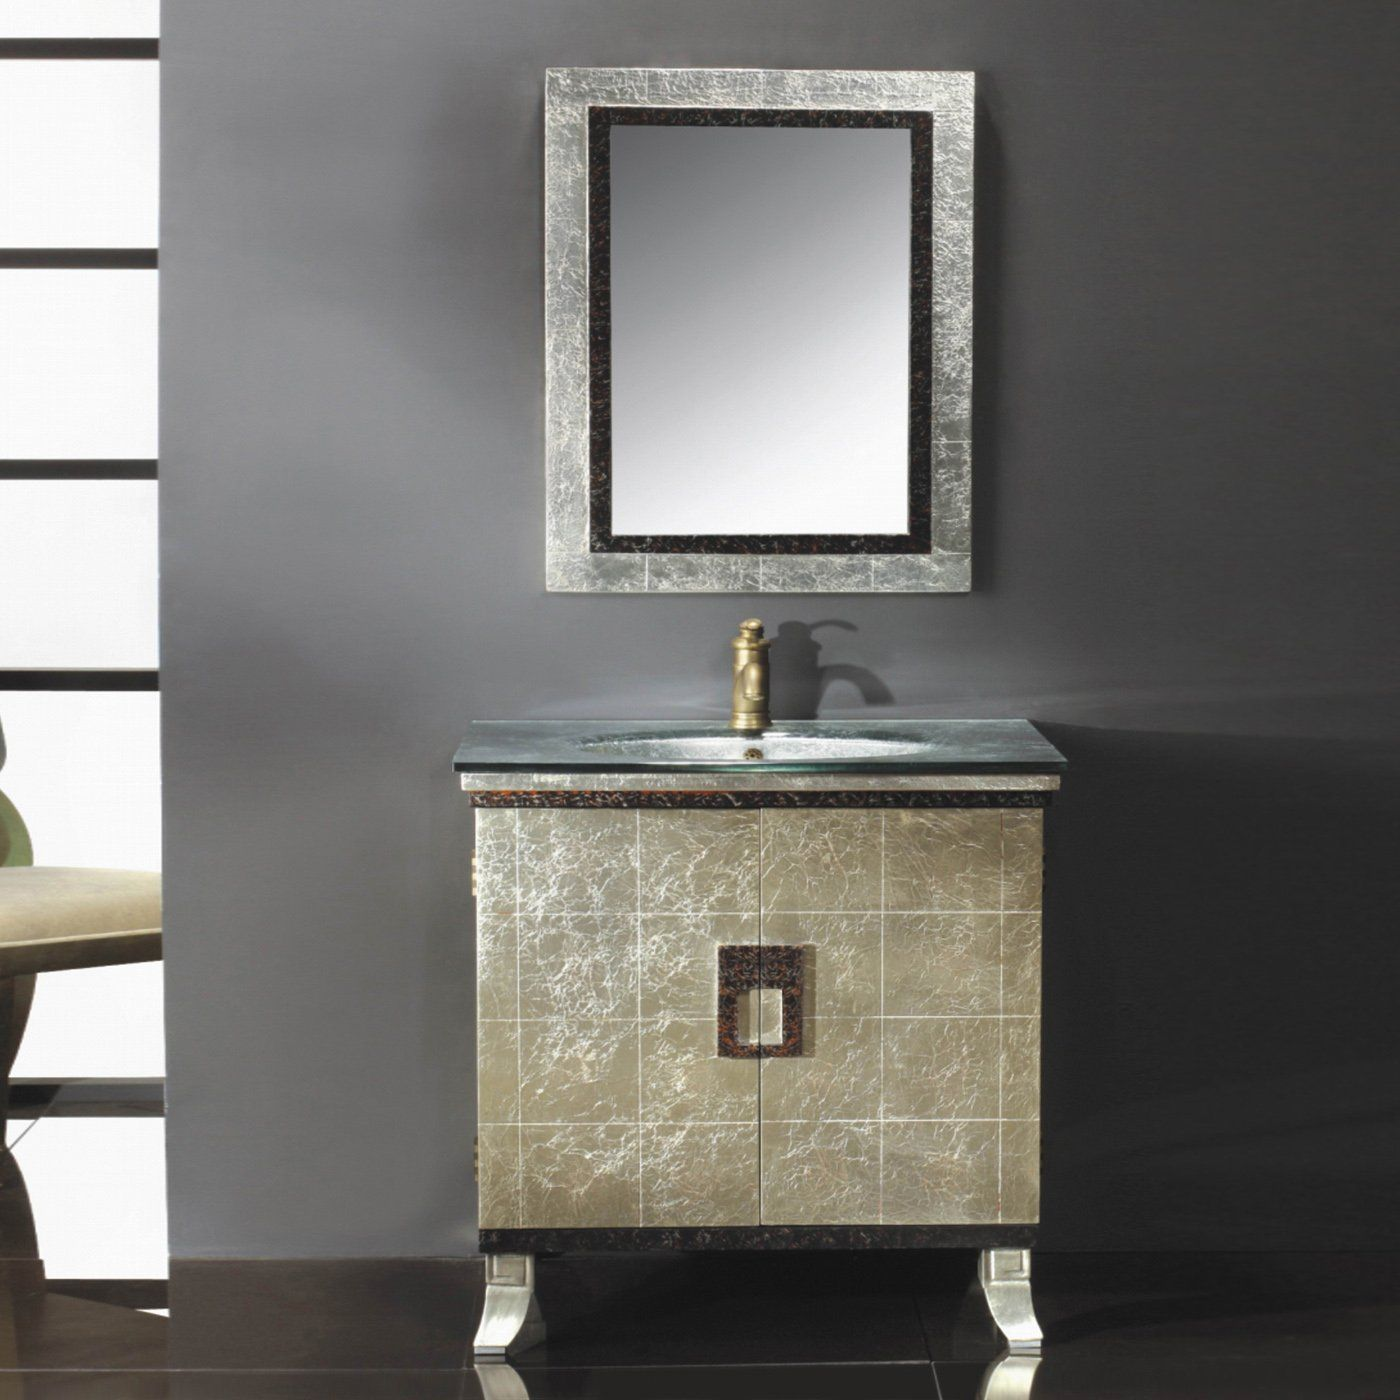 Yosemite Home Decor Rassgd 09a Contemporary Single Vanity Vanity